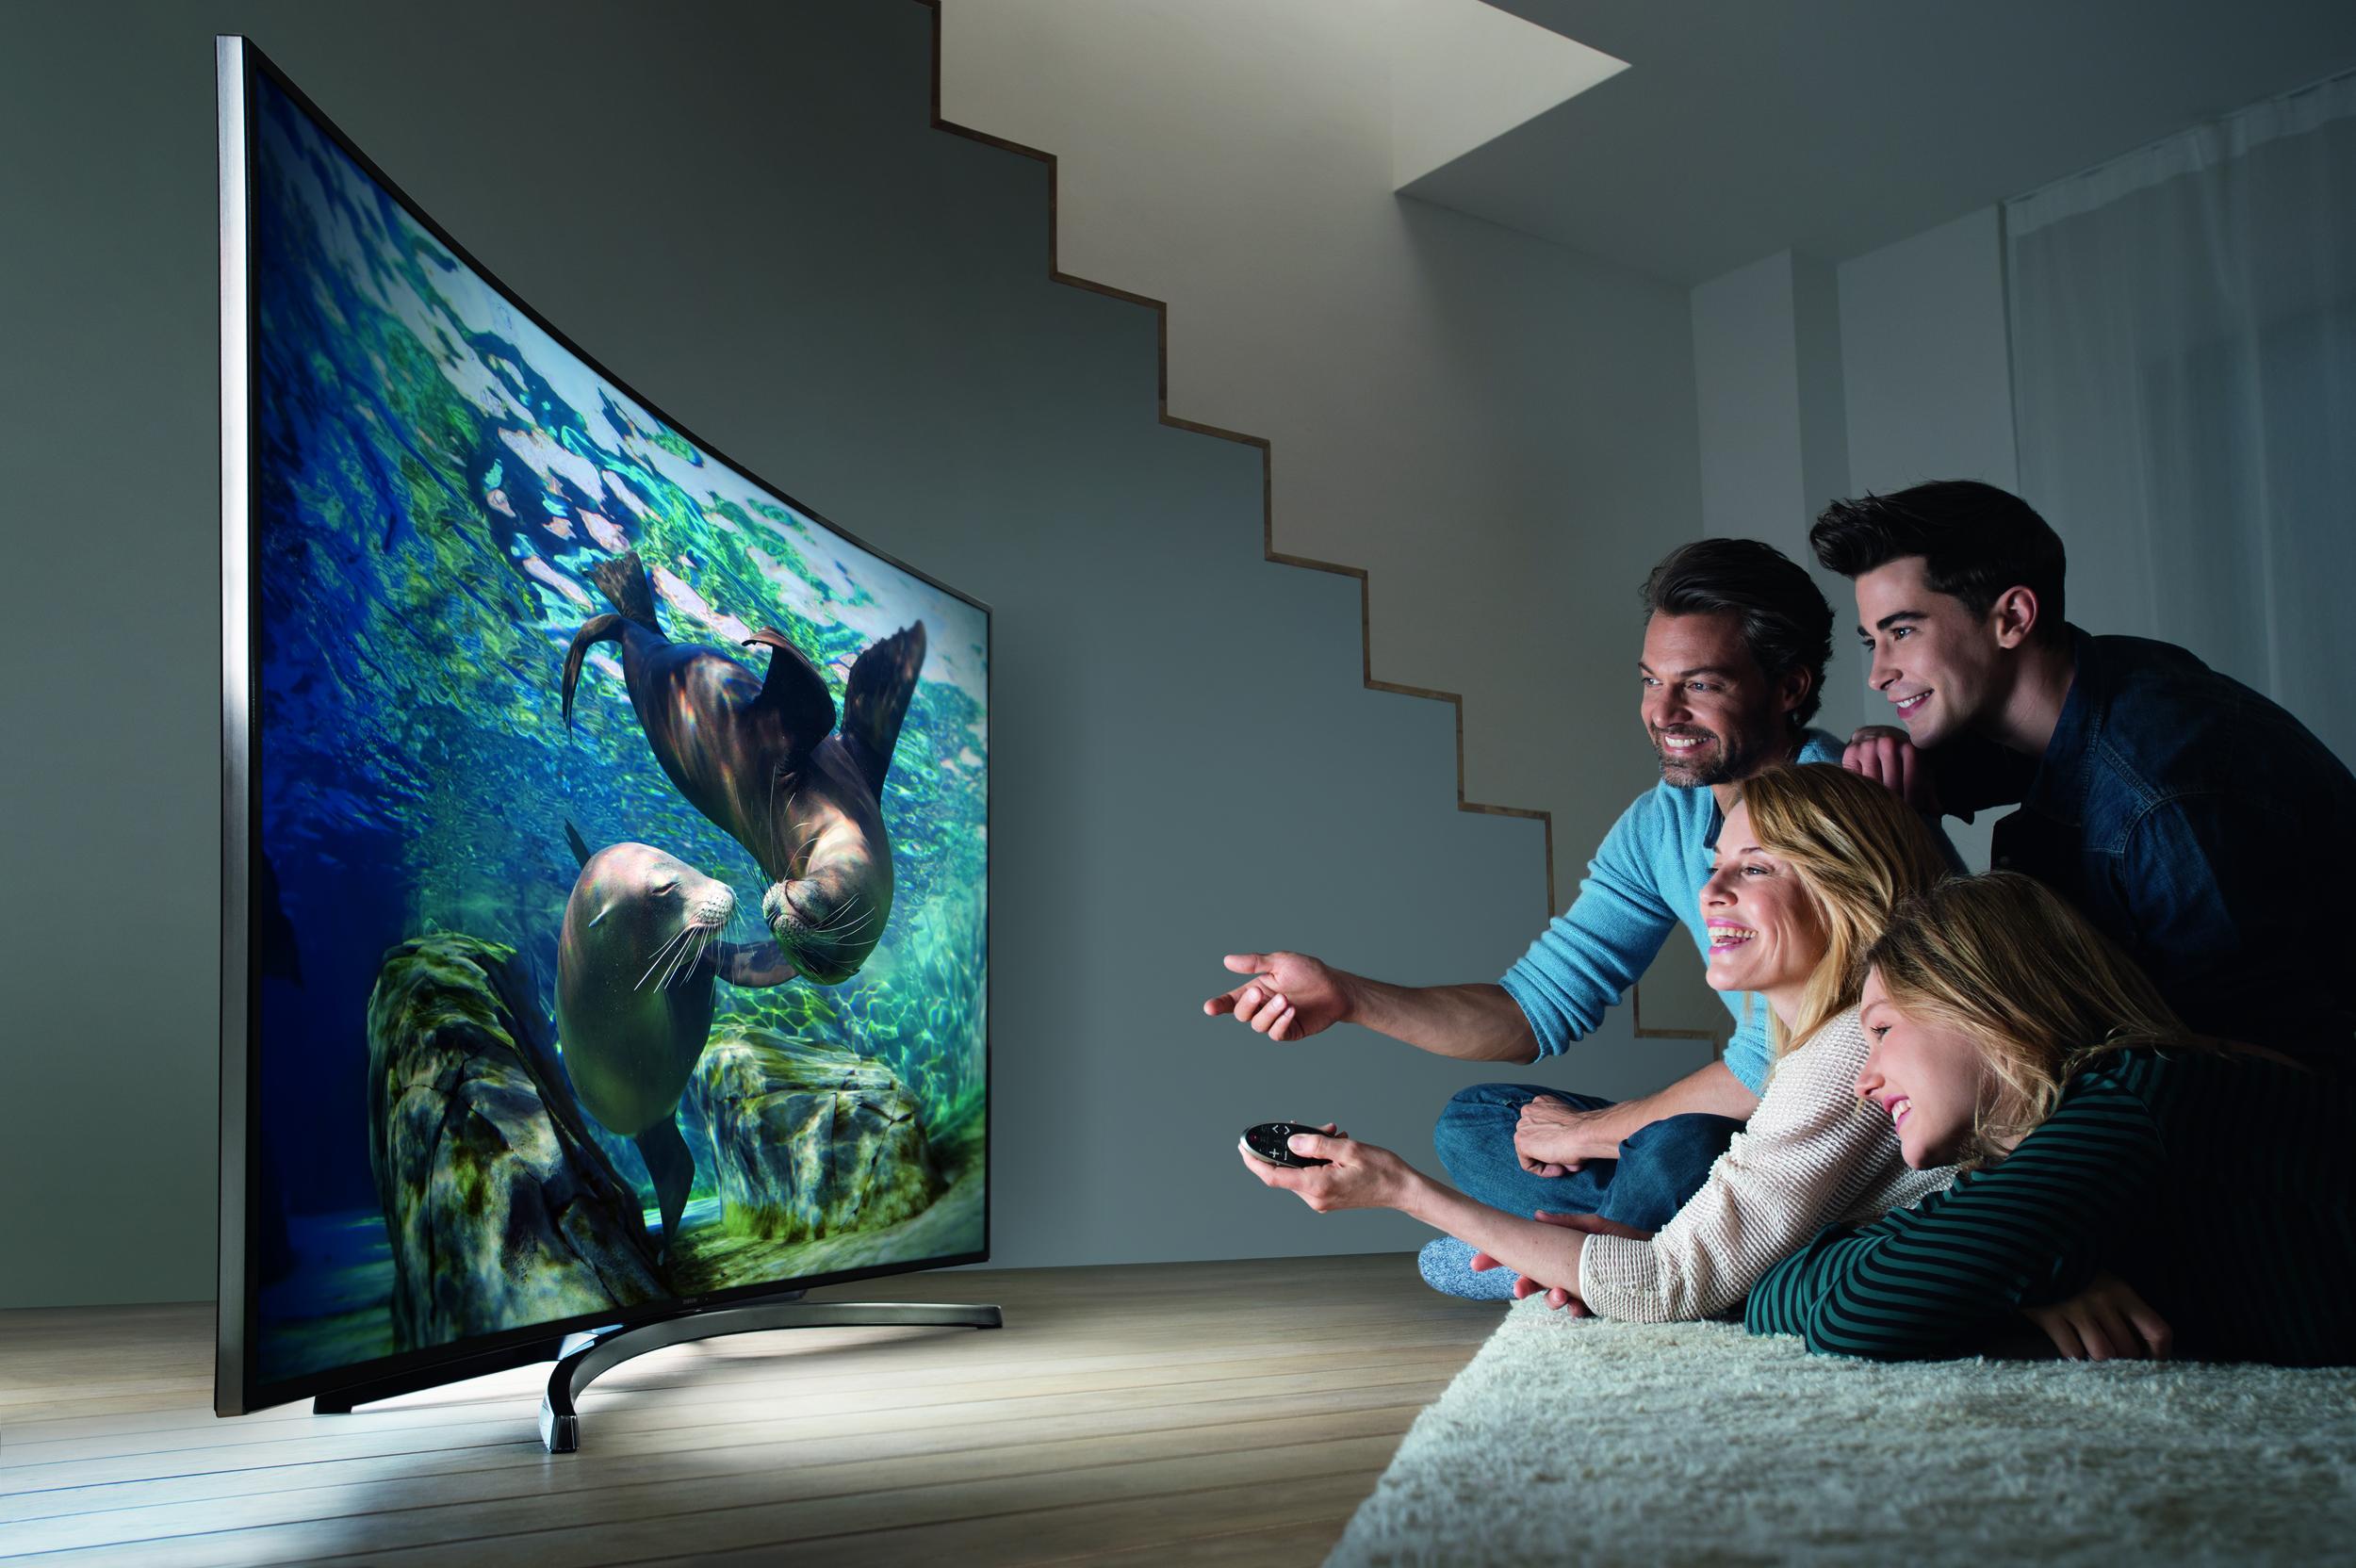 Samsung_TV_U8090_Curved_Familie_148.jpg